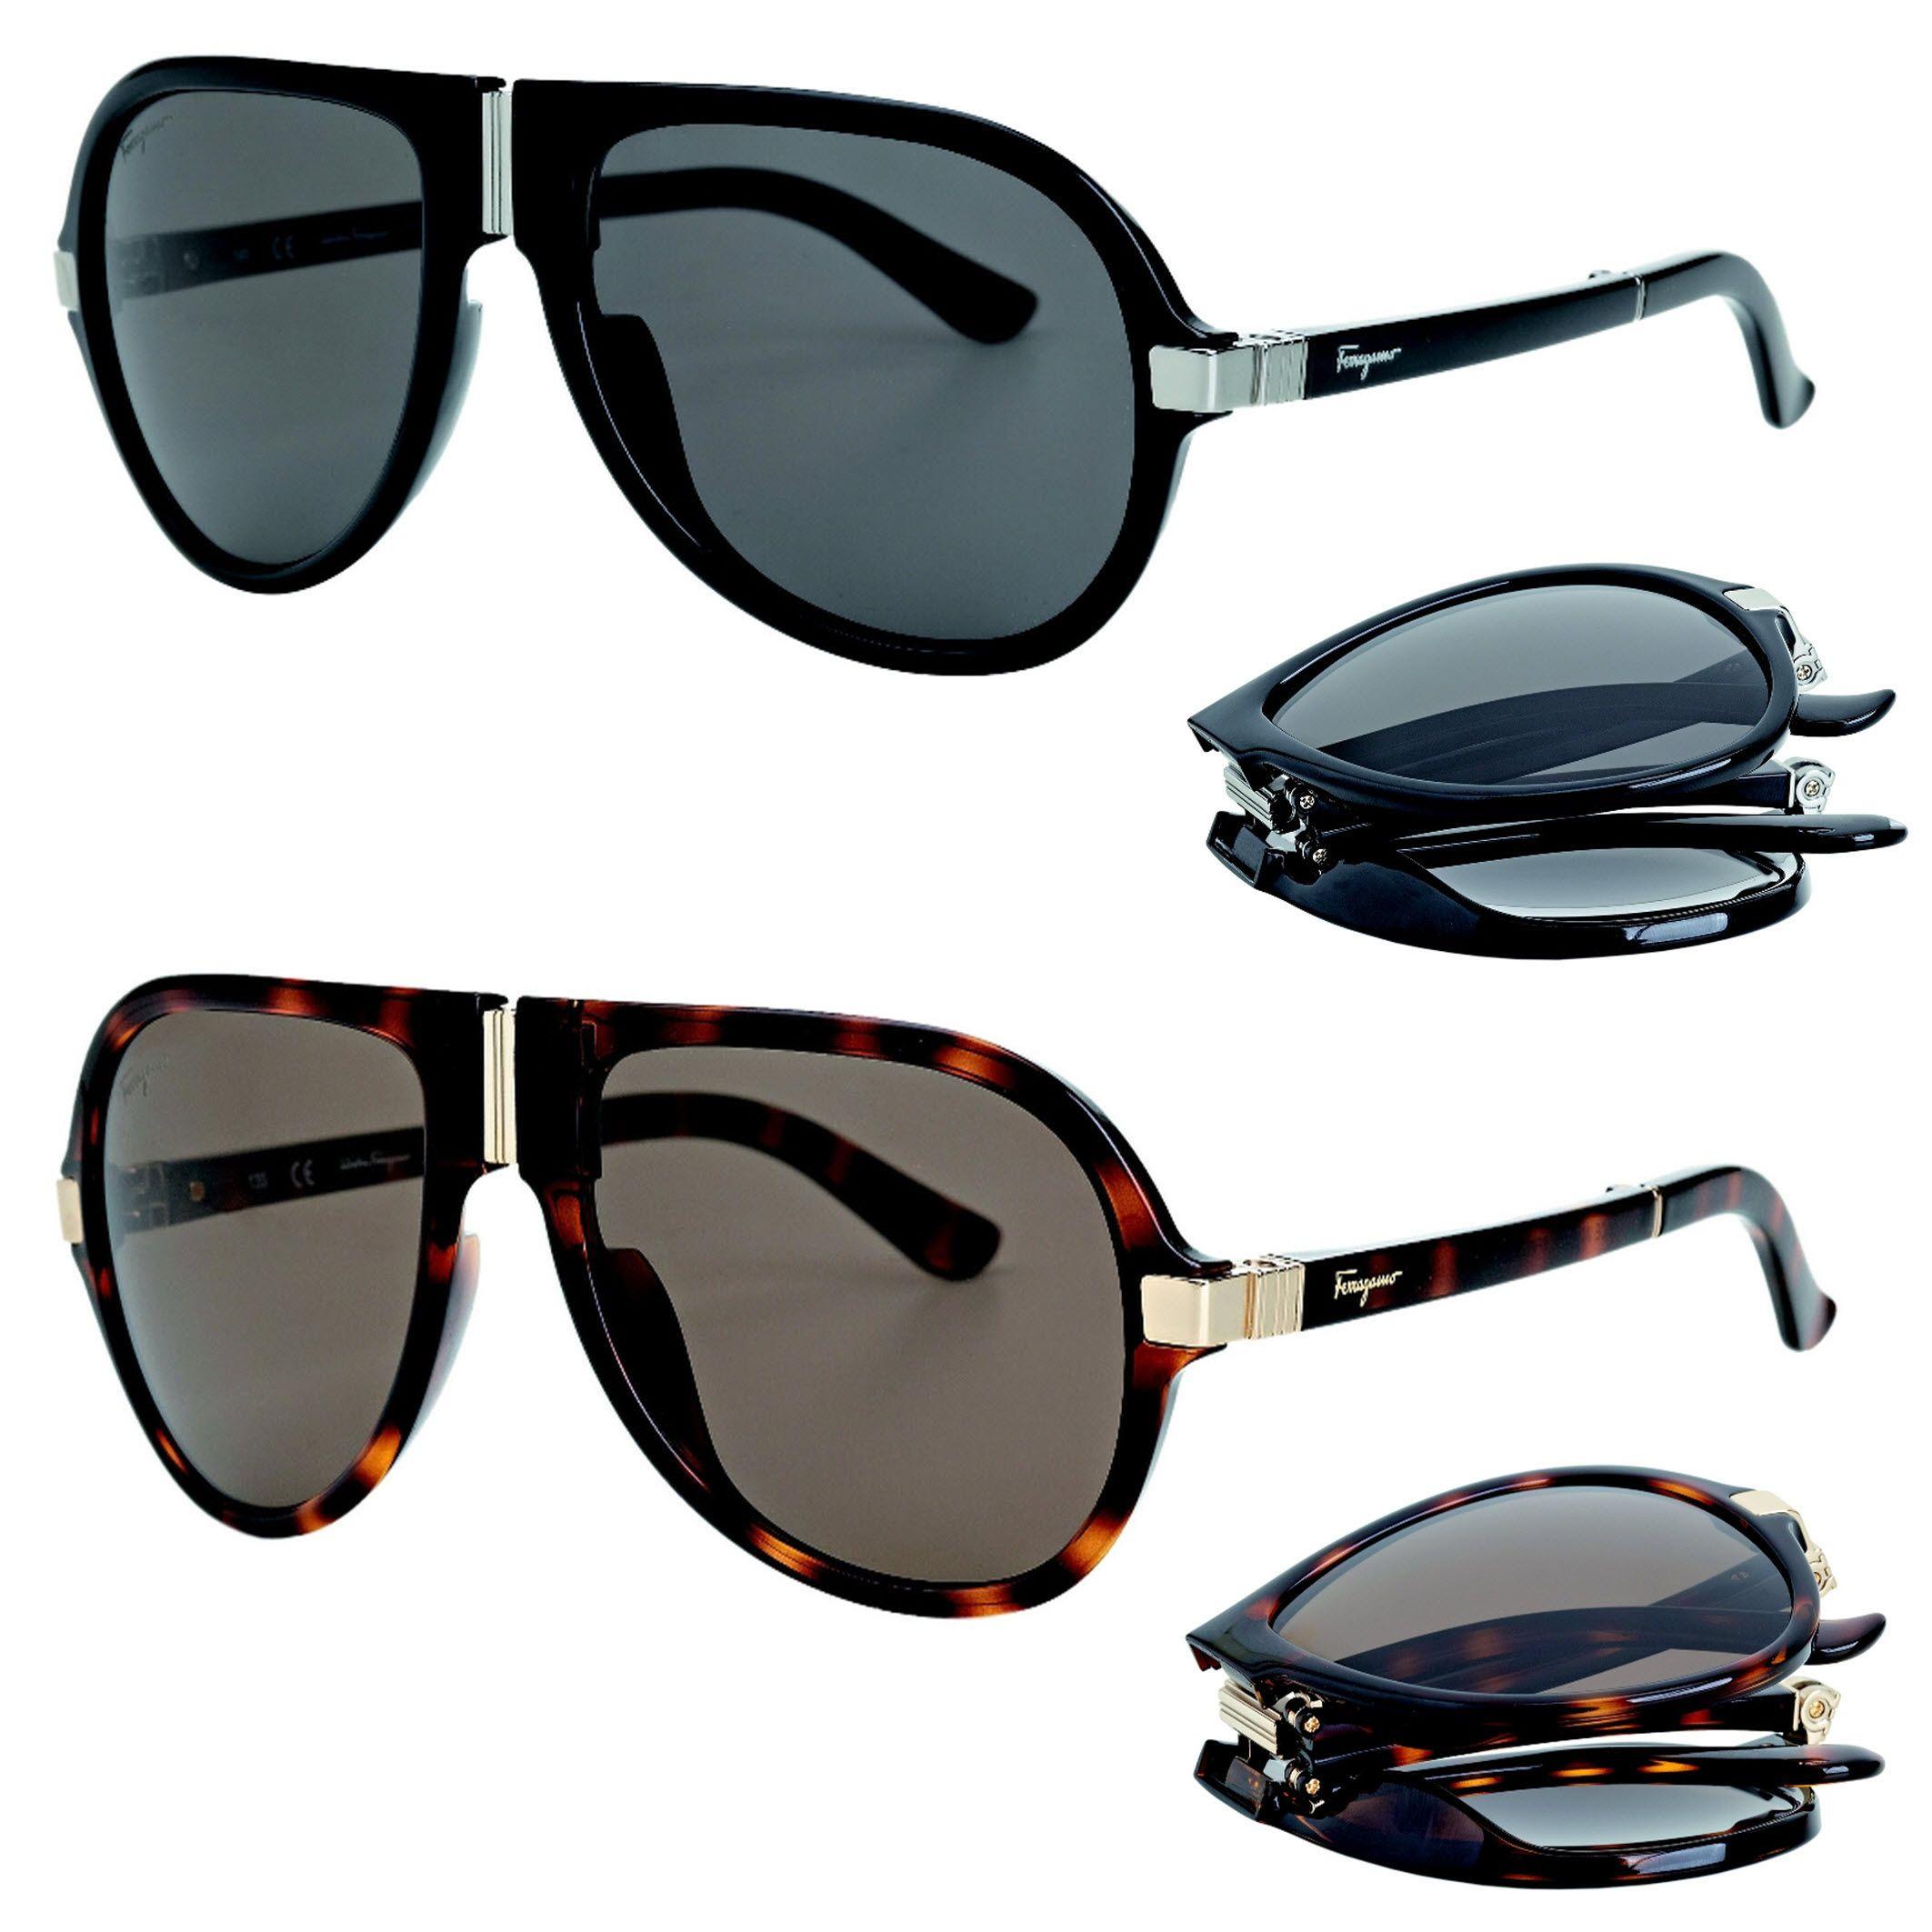 7abbb51d449c Salvatore Ferragamo Folding Sunglasses Spring Summer 2014 | Luxe Men ...